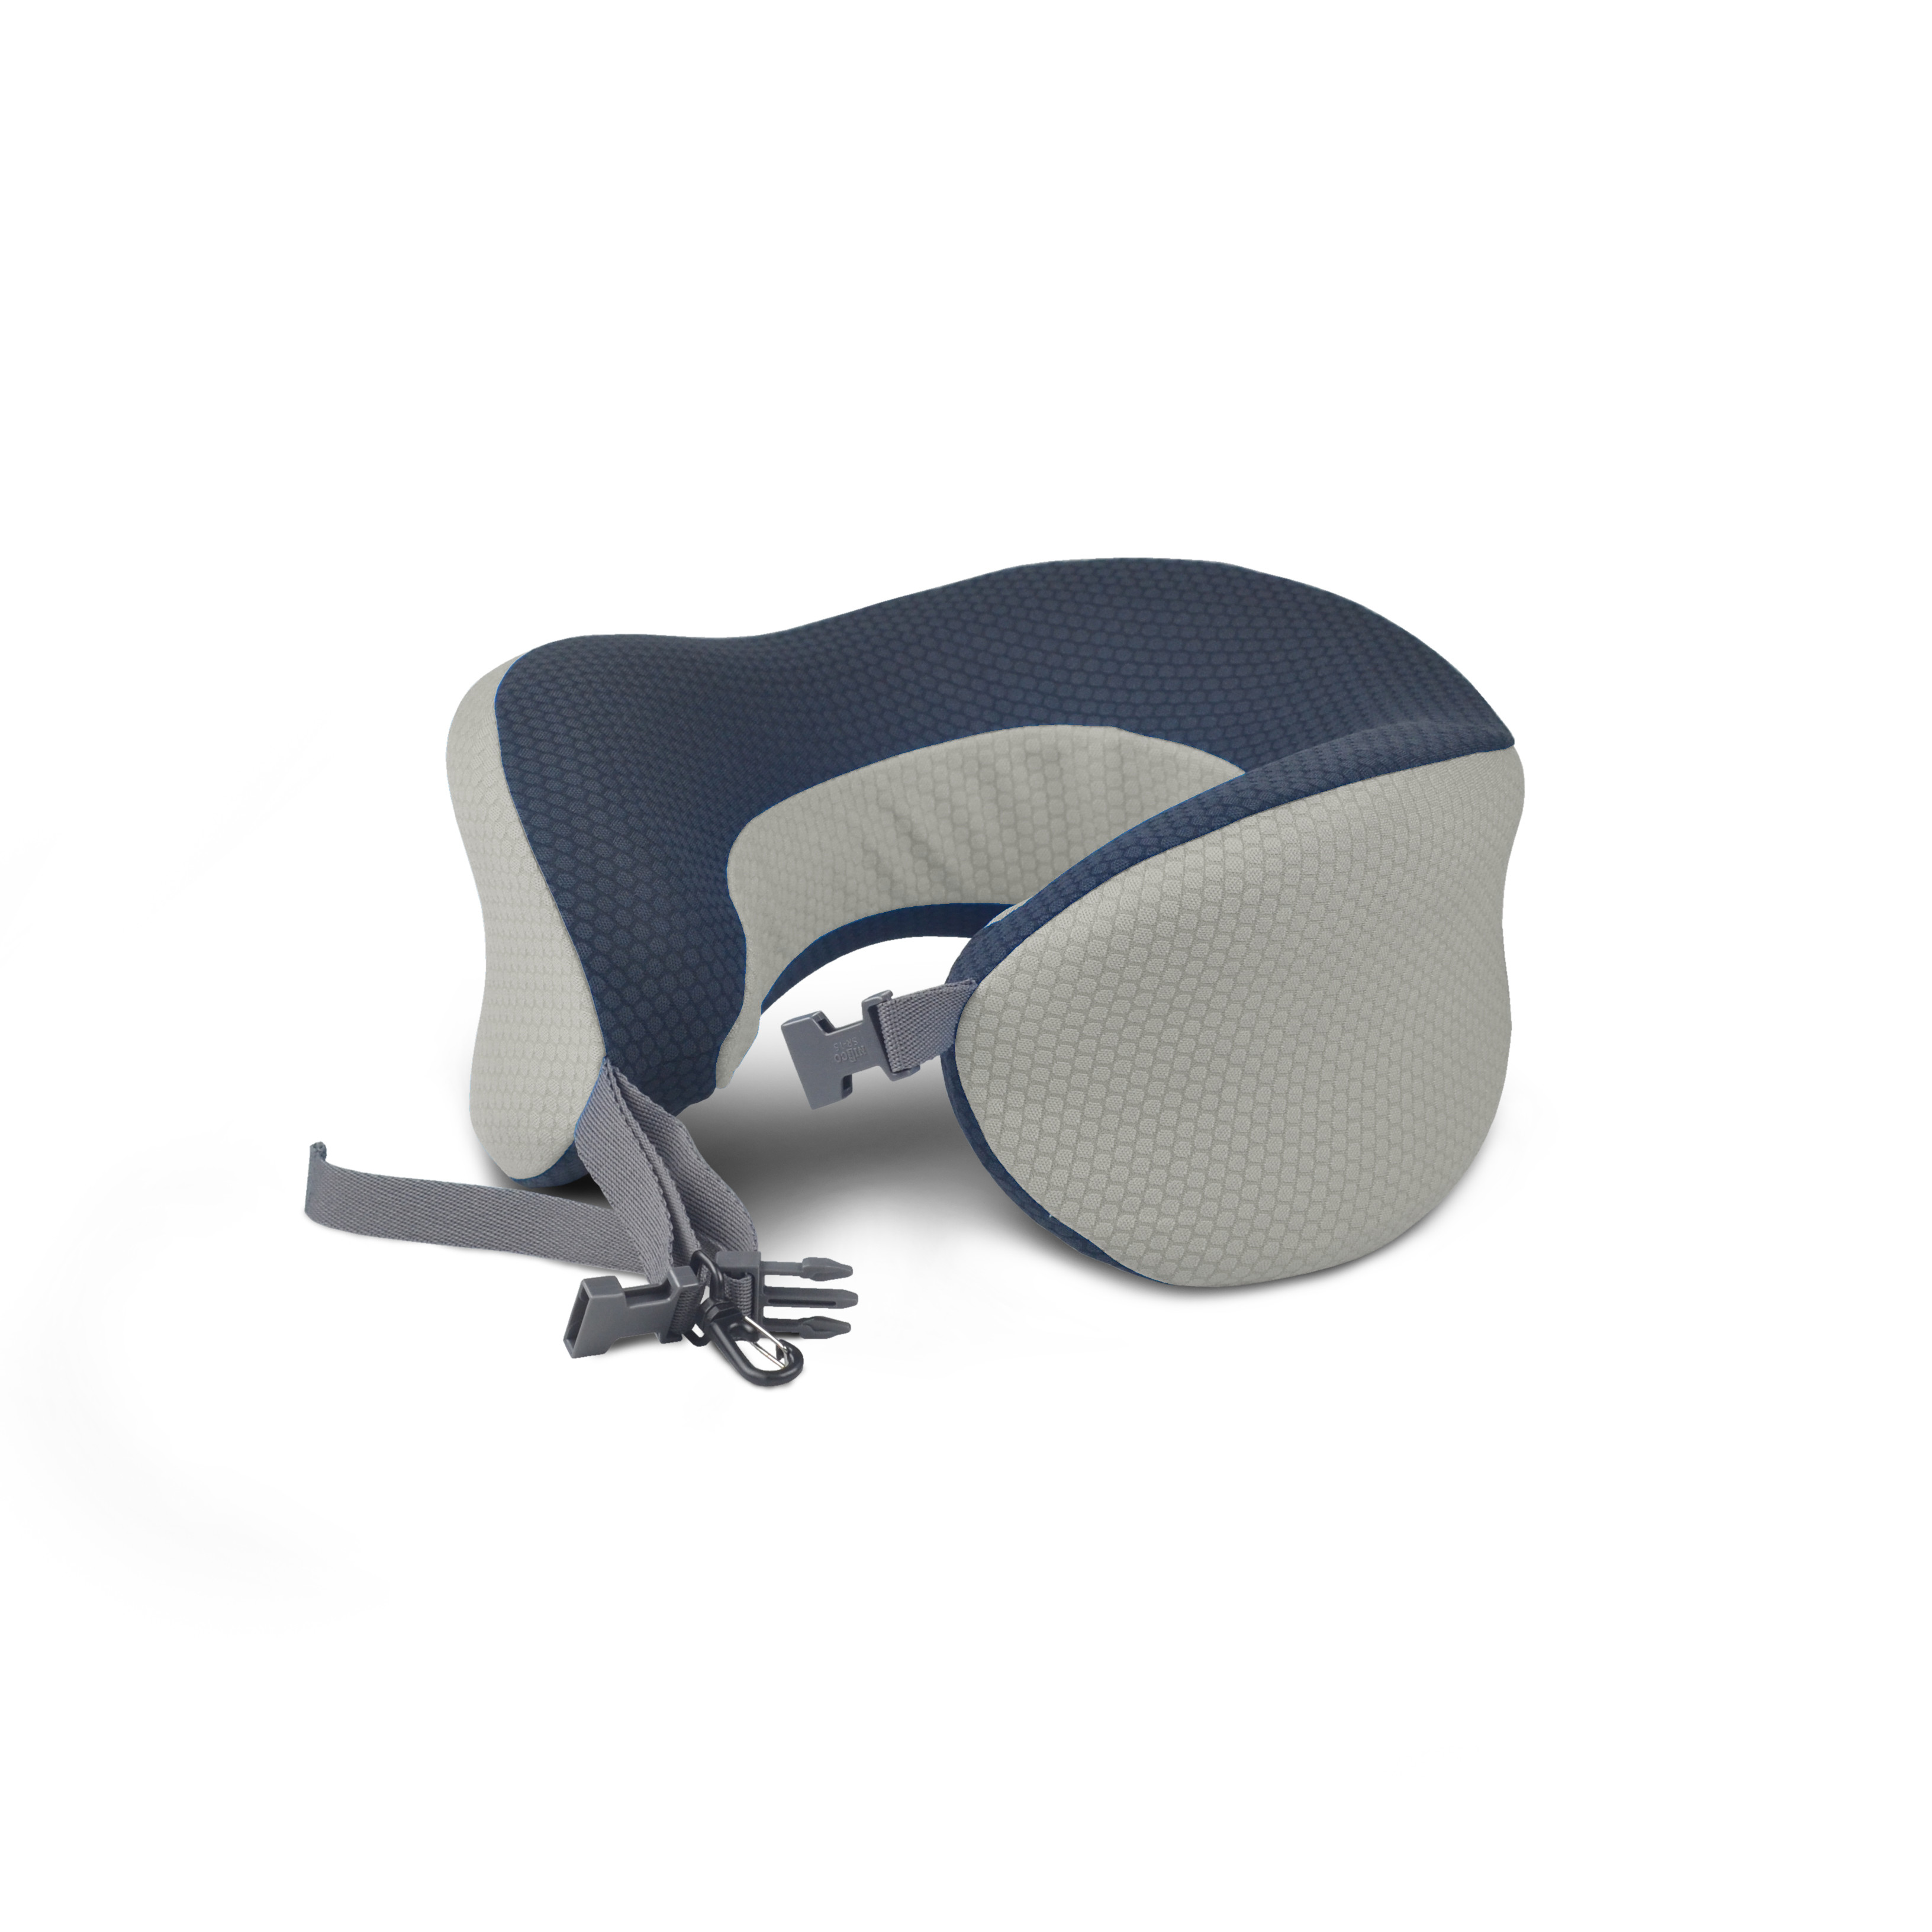 Gray portable custom travel pillow foldable travel pillow